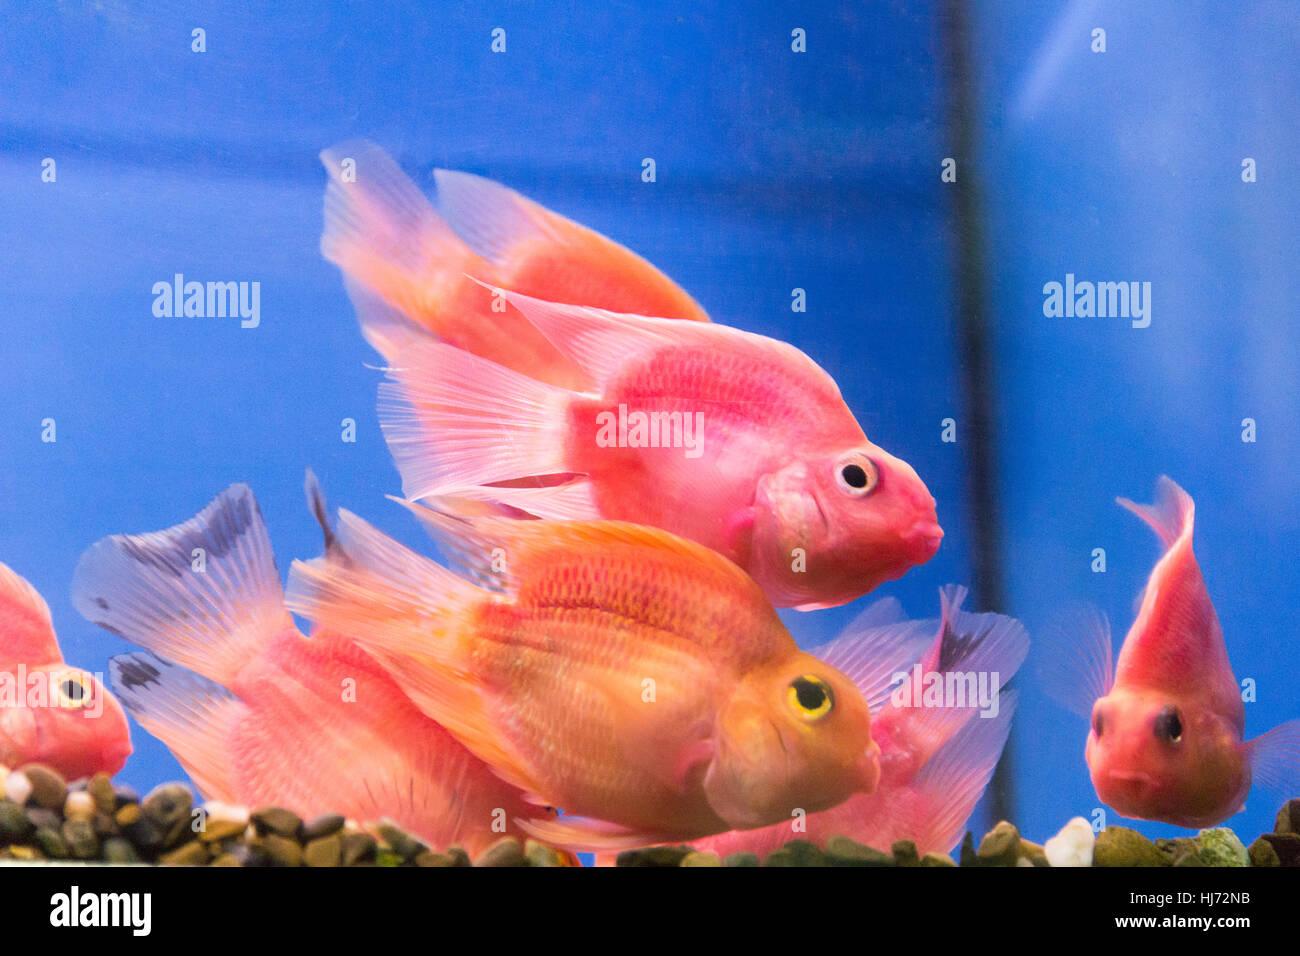 Photo Of Aquarium Fish Parrot Cichlid In Freshwater Stock Photo